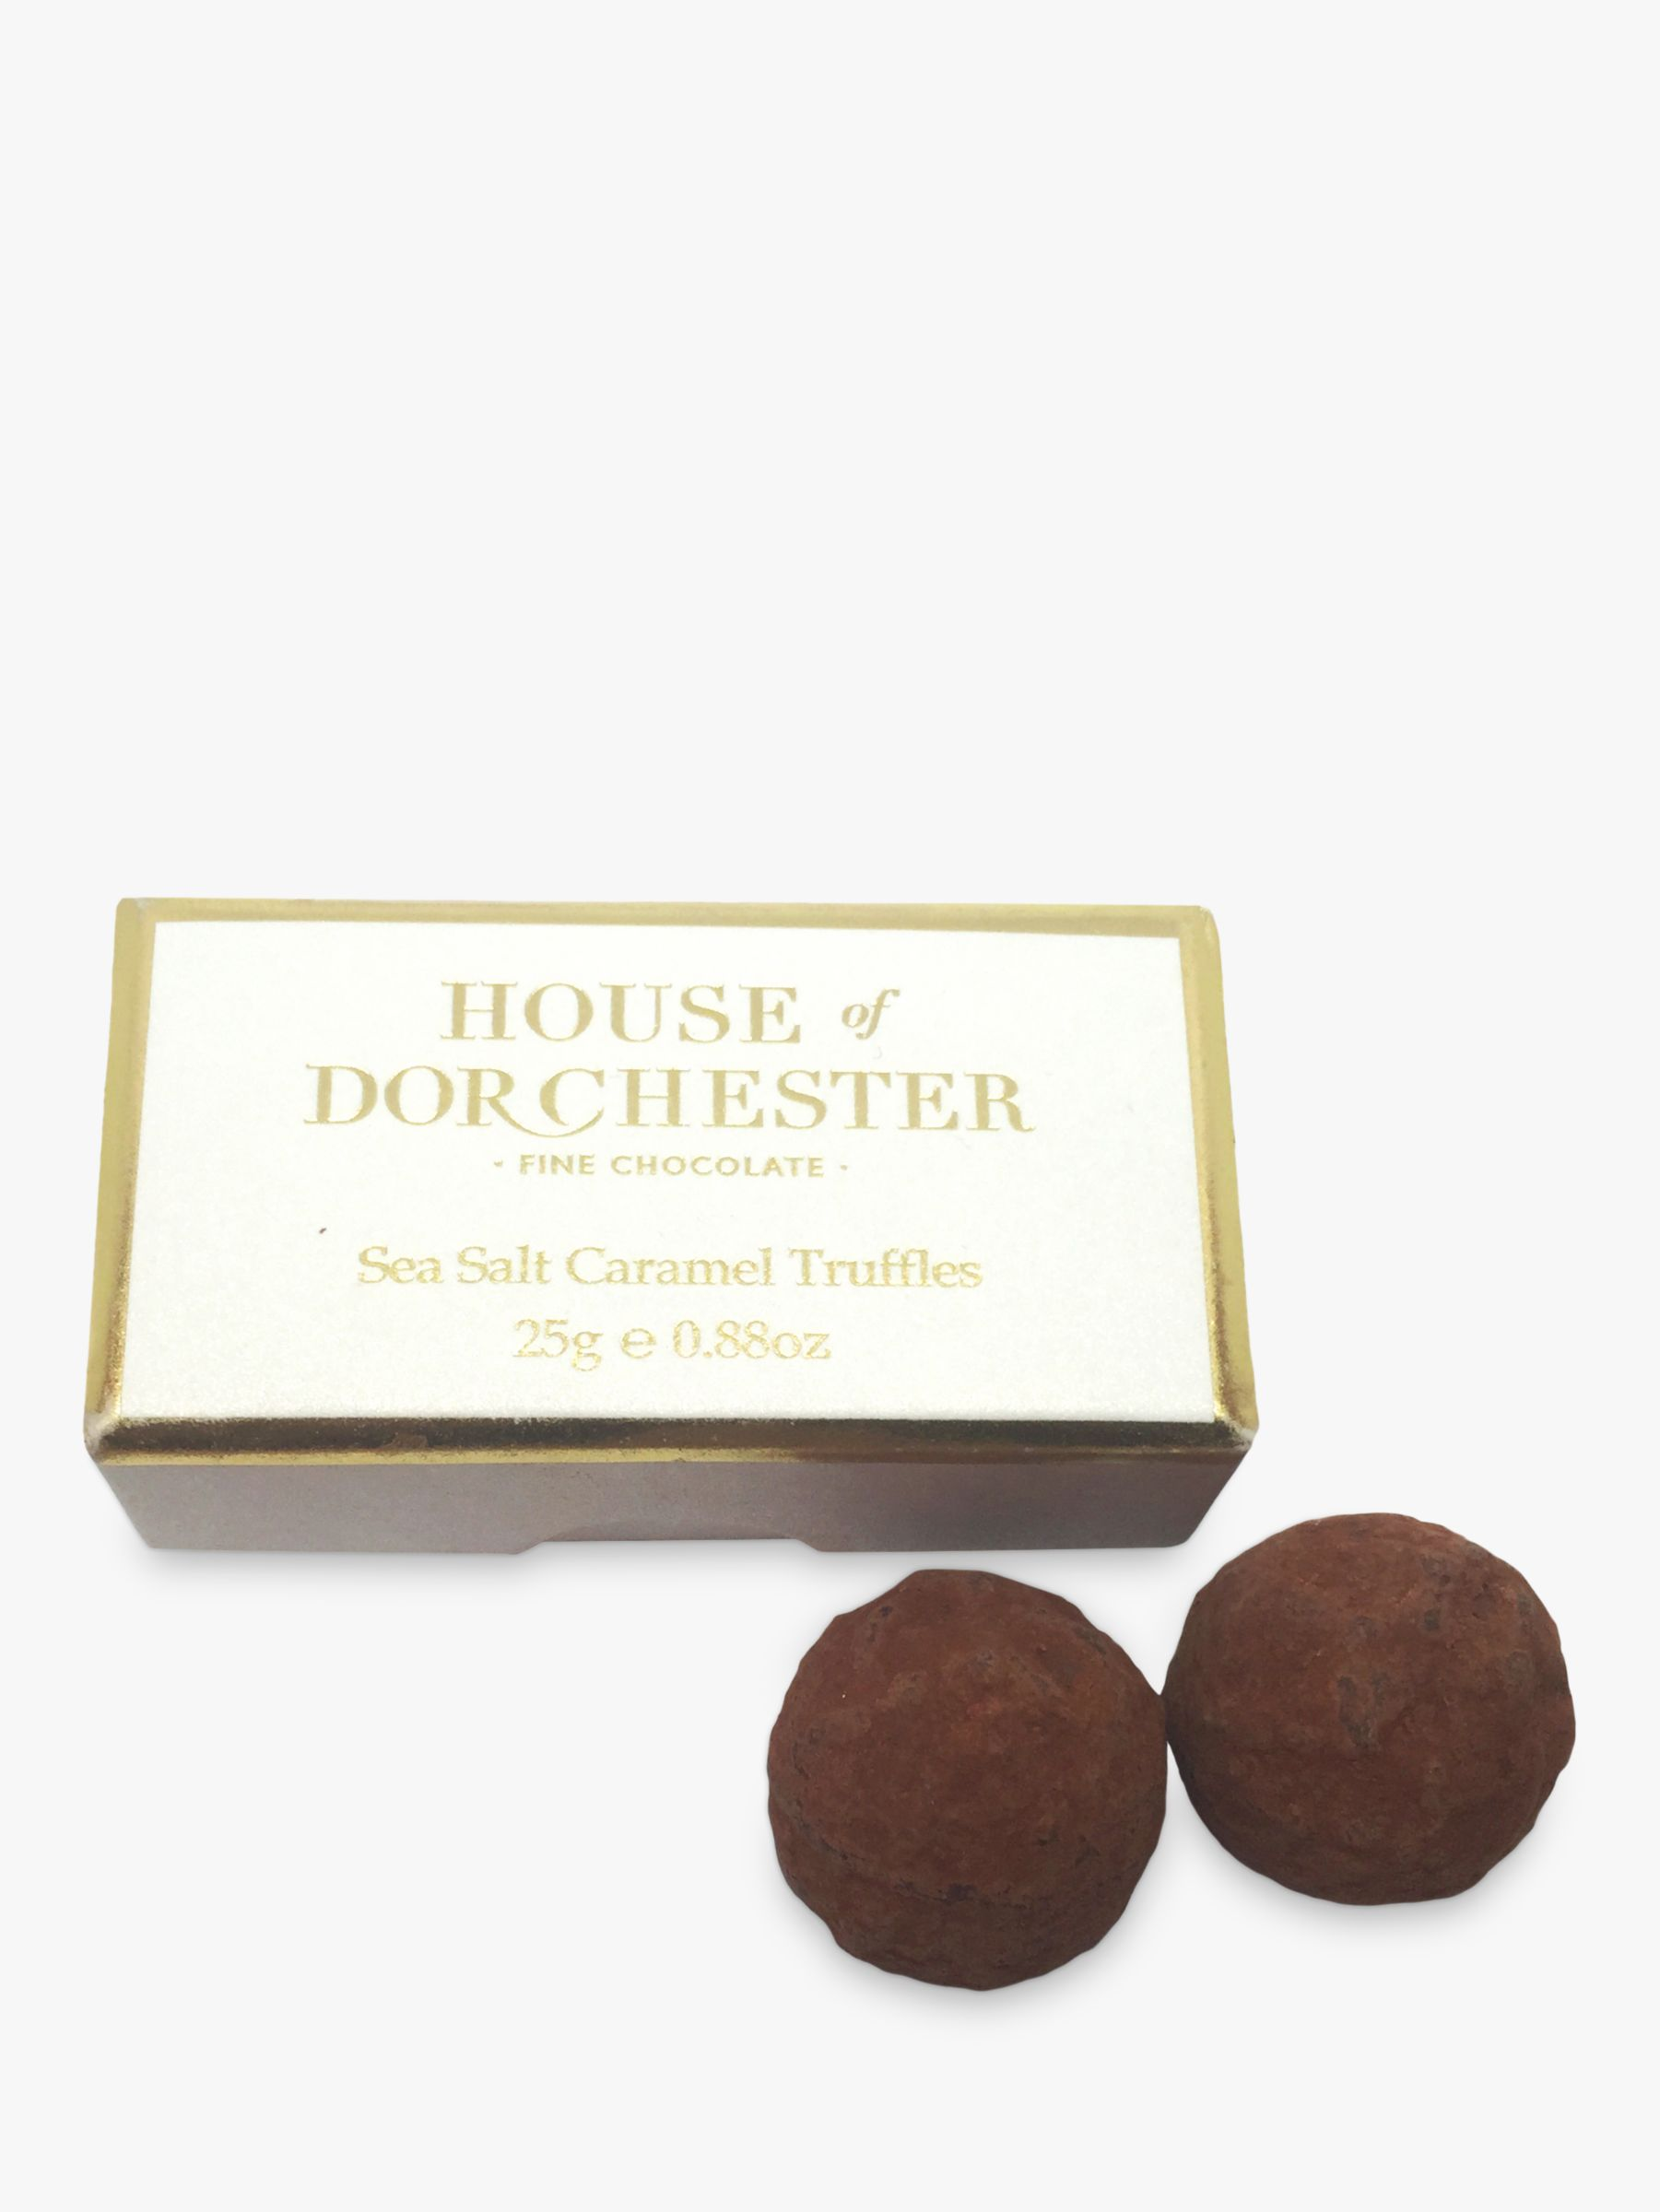 House of Dorchester House of Dorchester Seasalt Caramel Truffles, 25g